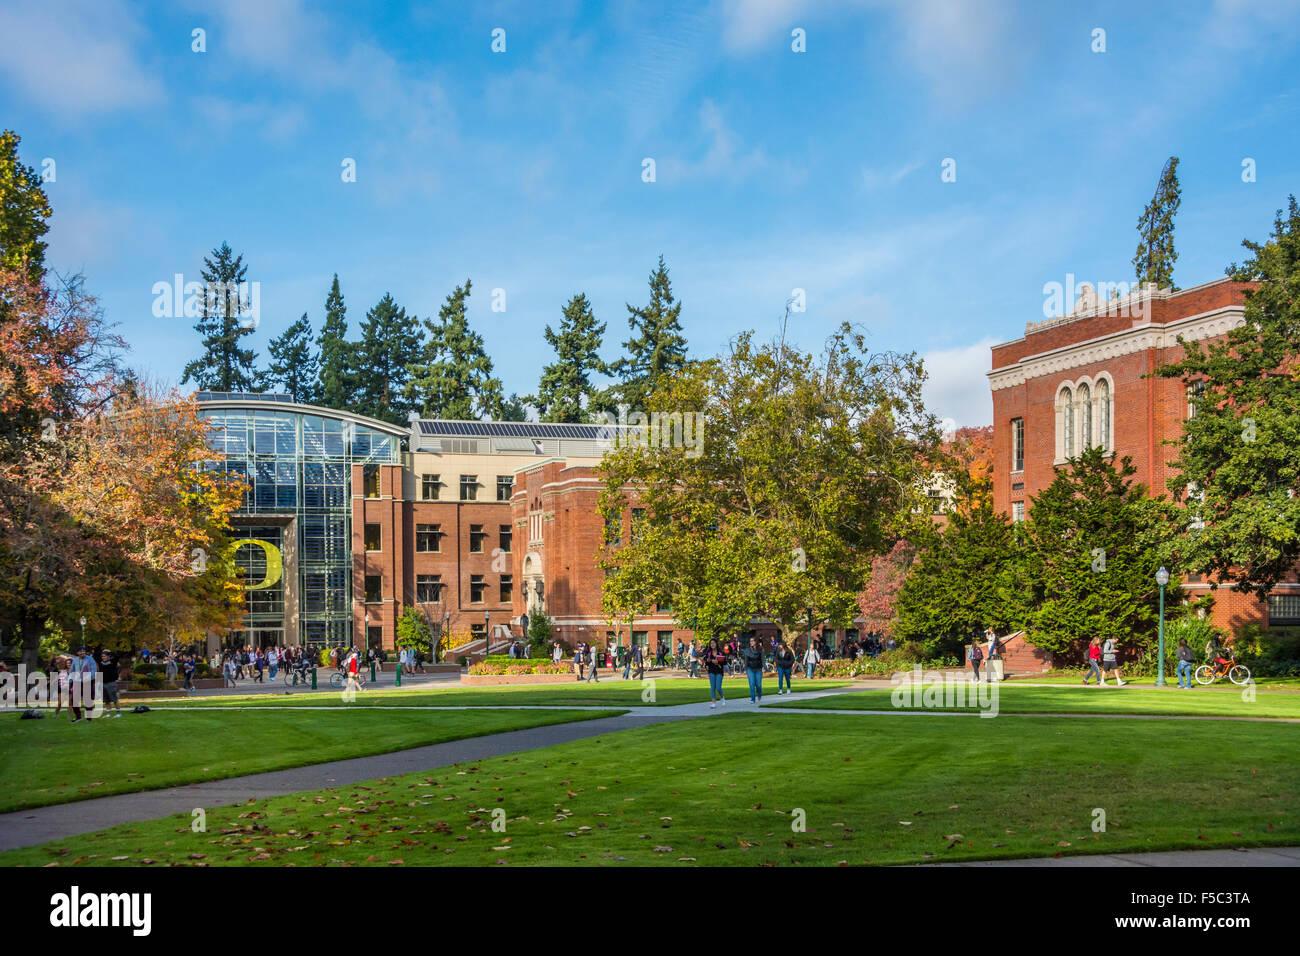 Lillis Hall and Anstett Hall, Lundquist College of Business; University of Oregon, Eugene, Oregon. - Stock Image